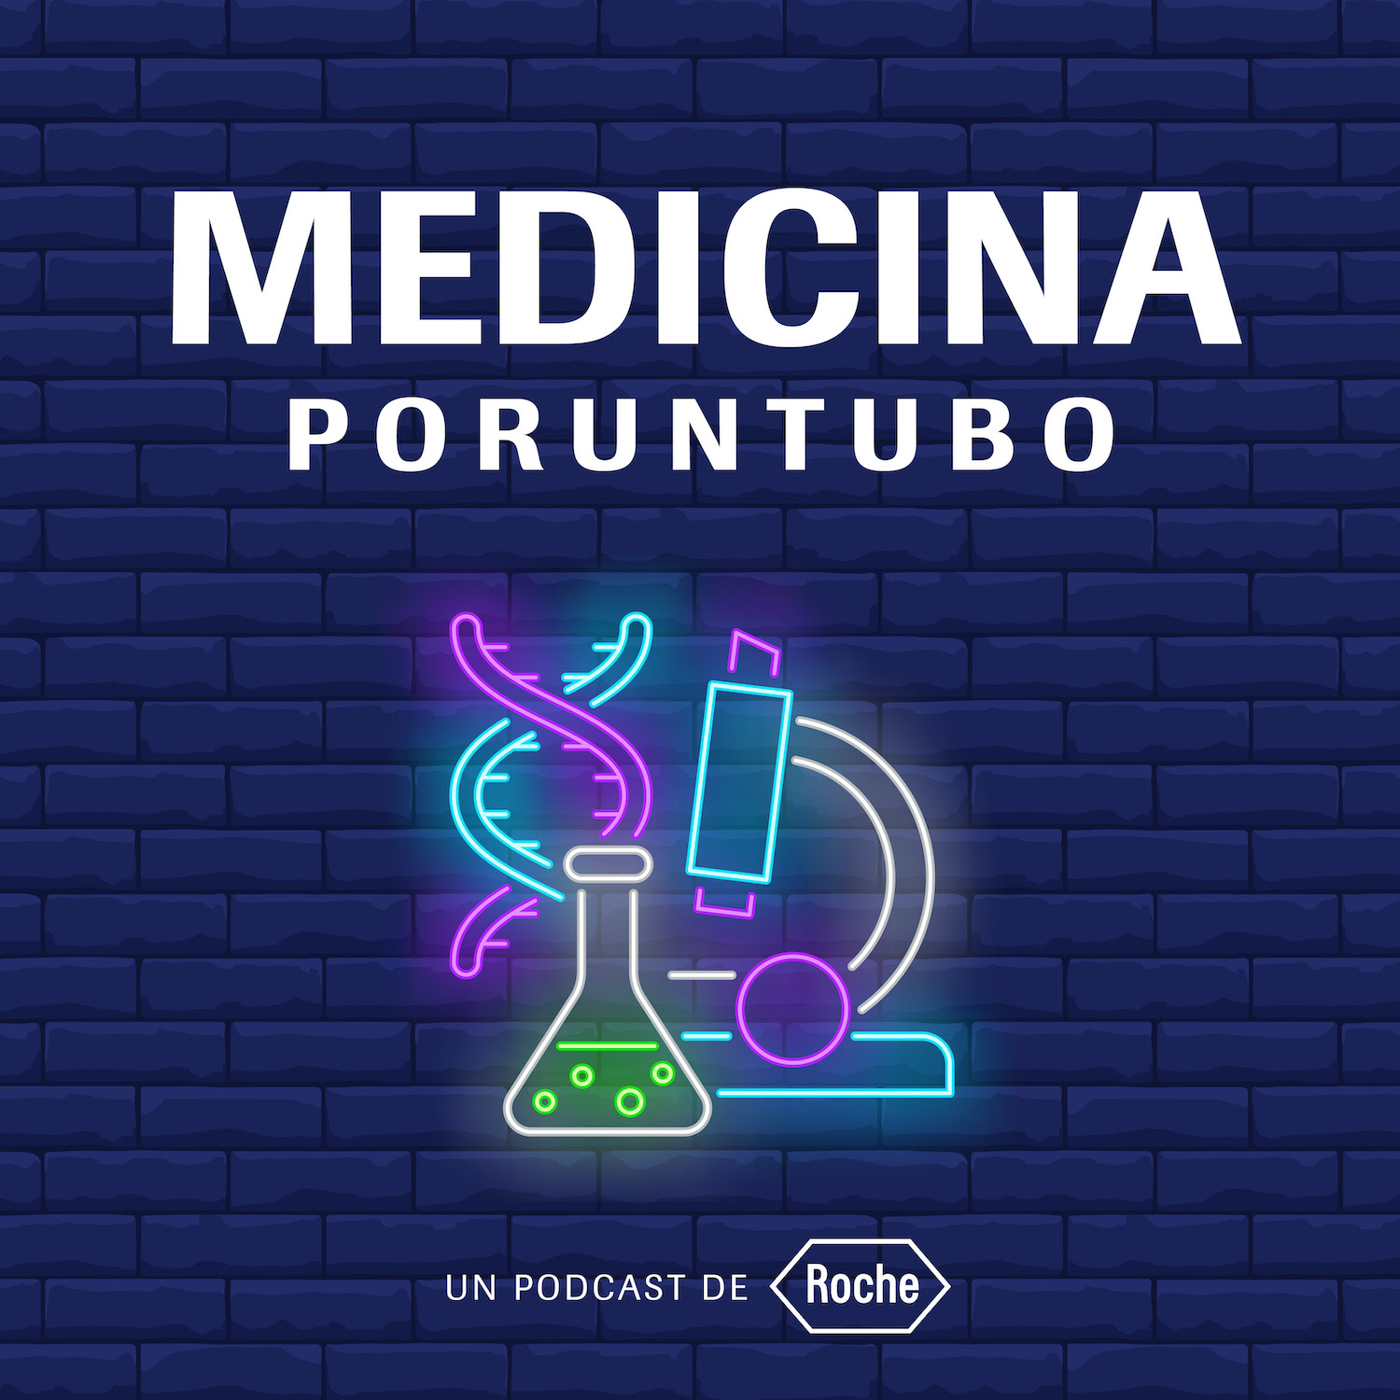 Medicina por un tubo